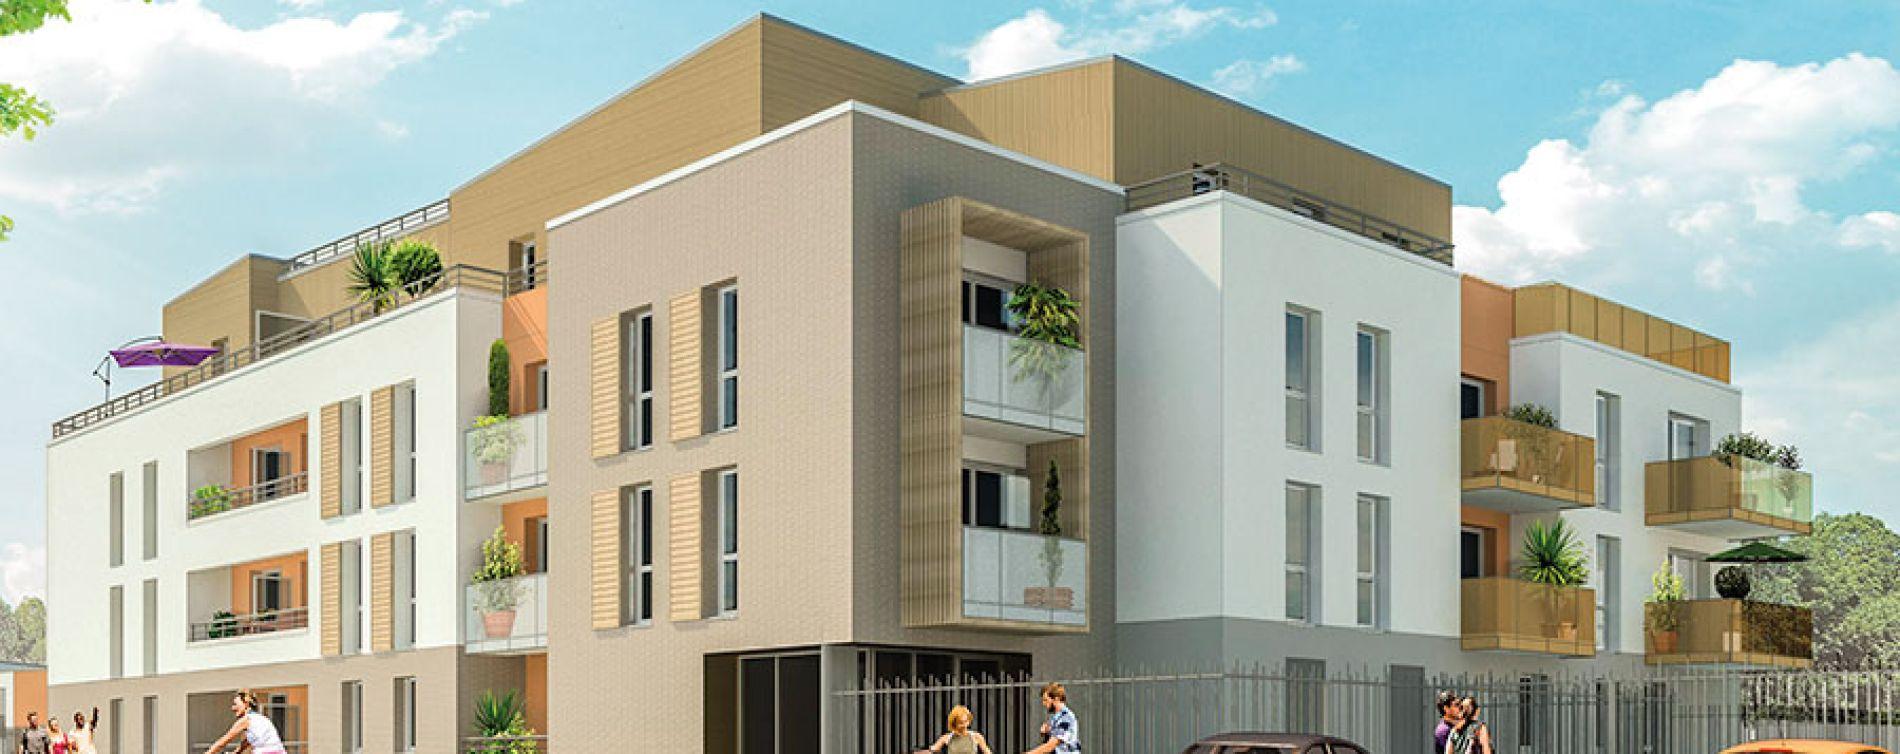 Saint-Jean-de-Braye : programme immobilier neuve « Edène » (2)